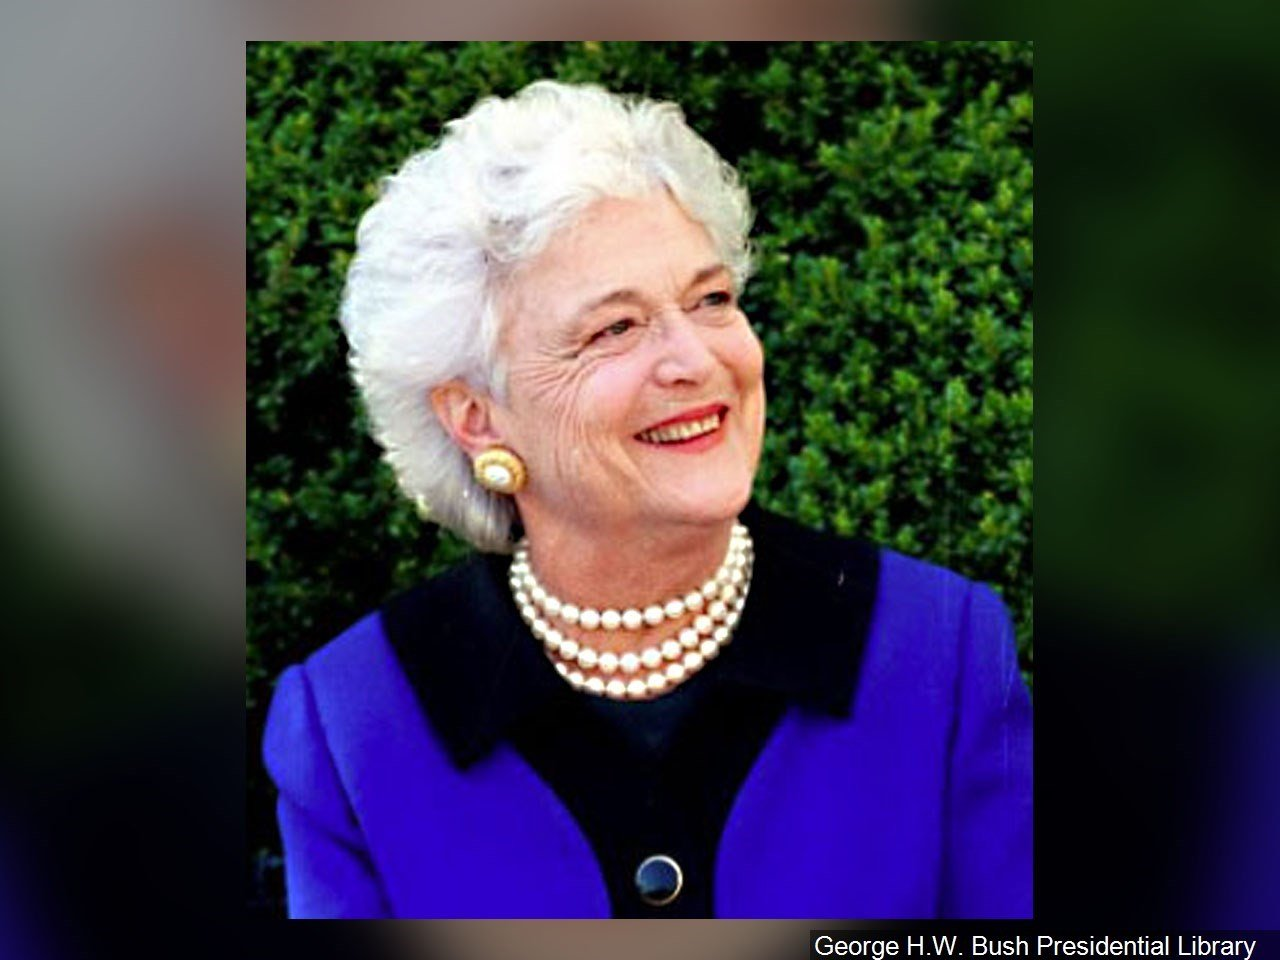 Sports stars, dignitaries arrive to Barbara Bush funeral / MGN Online